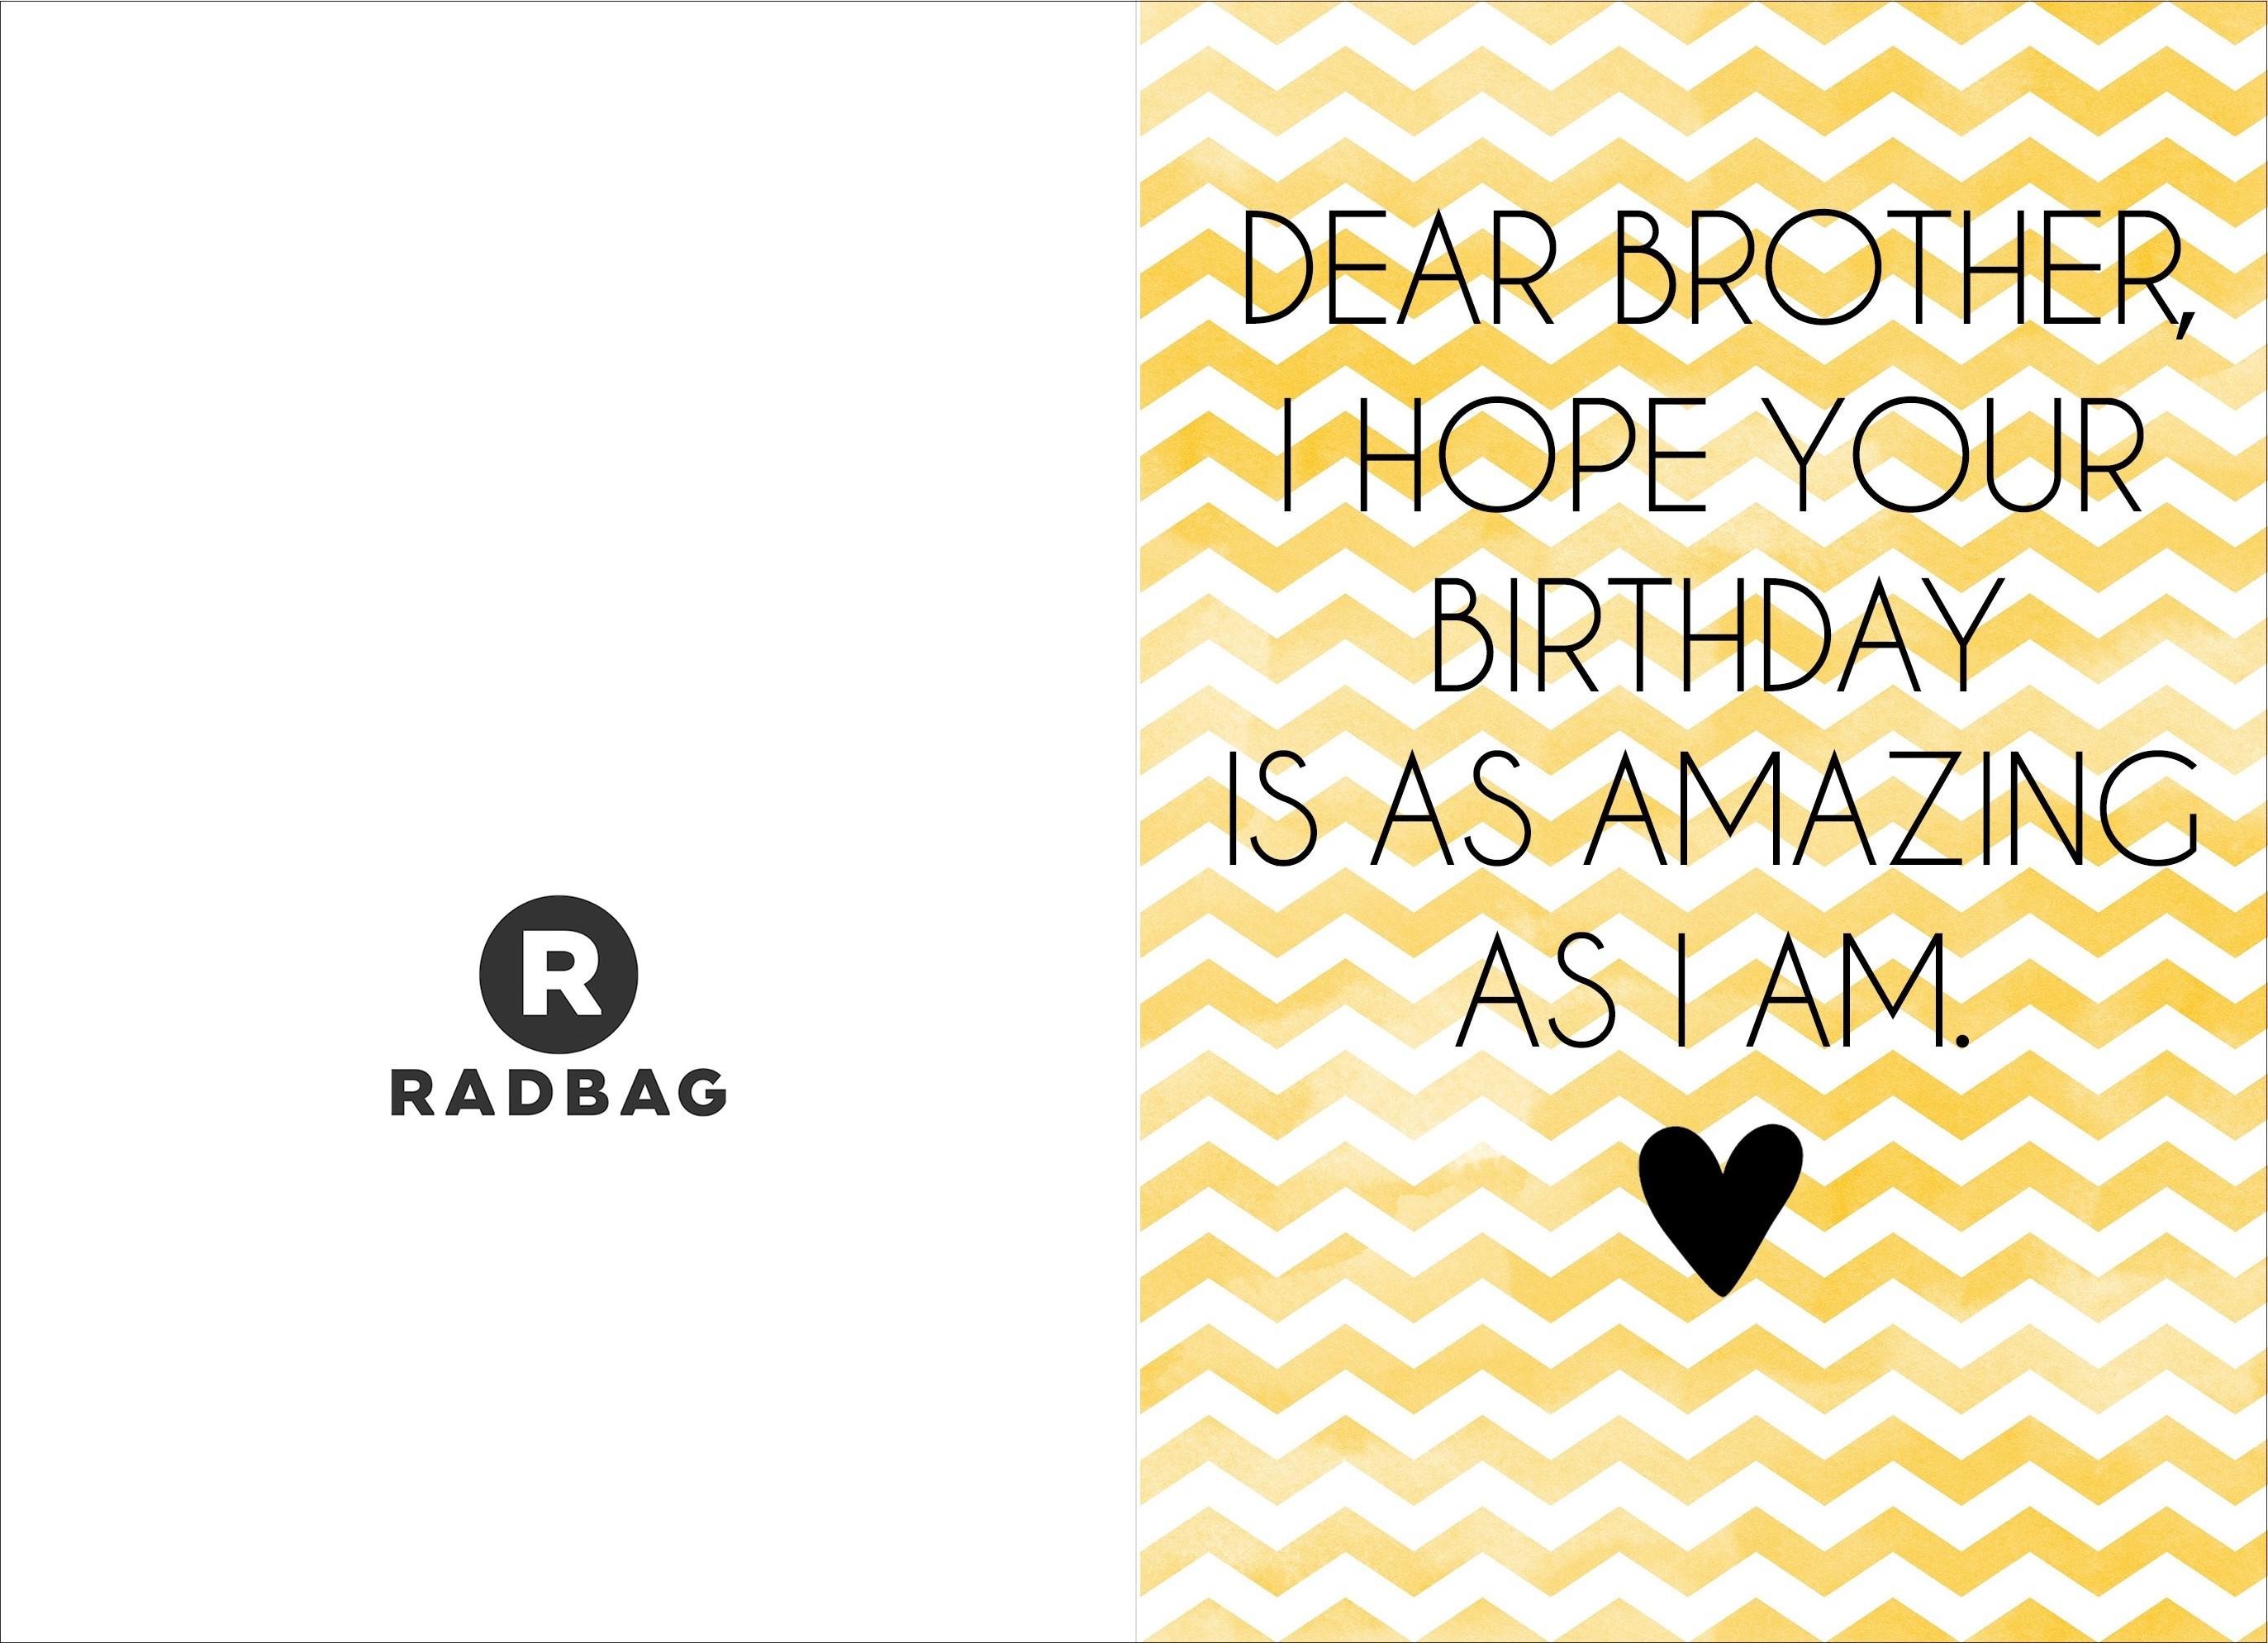 Lustige Geburtstagskarten  Witzige Geburtstagskarten zum Ausdrucken radbag